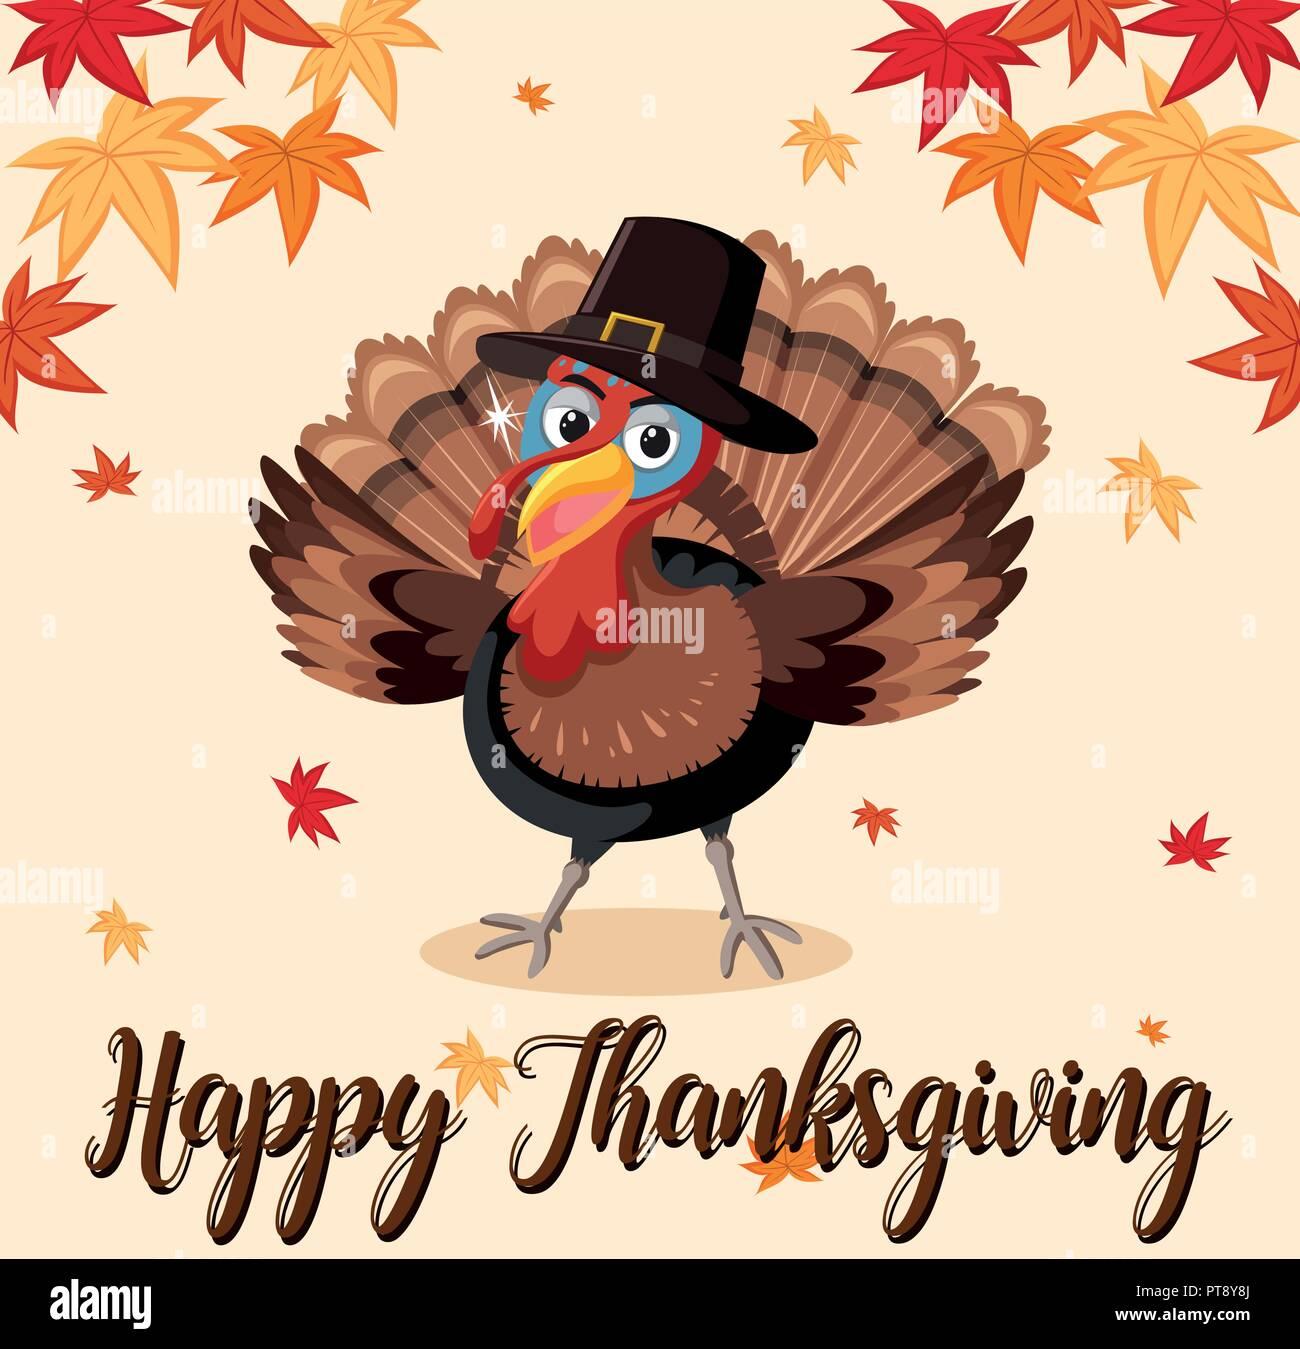 happy thanksgiving turkey template illustration stock vector art